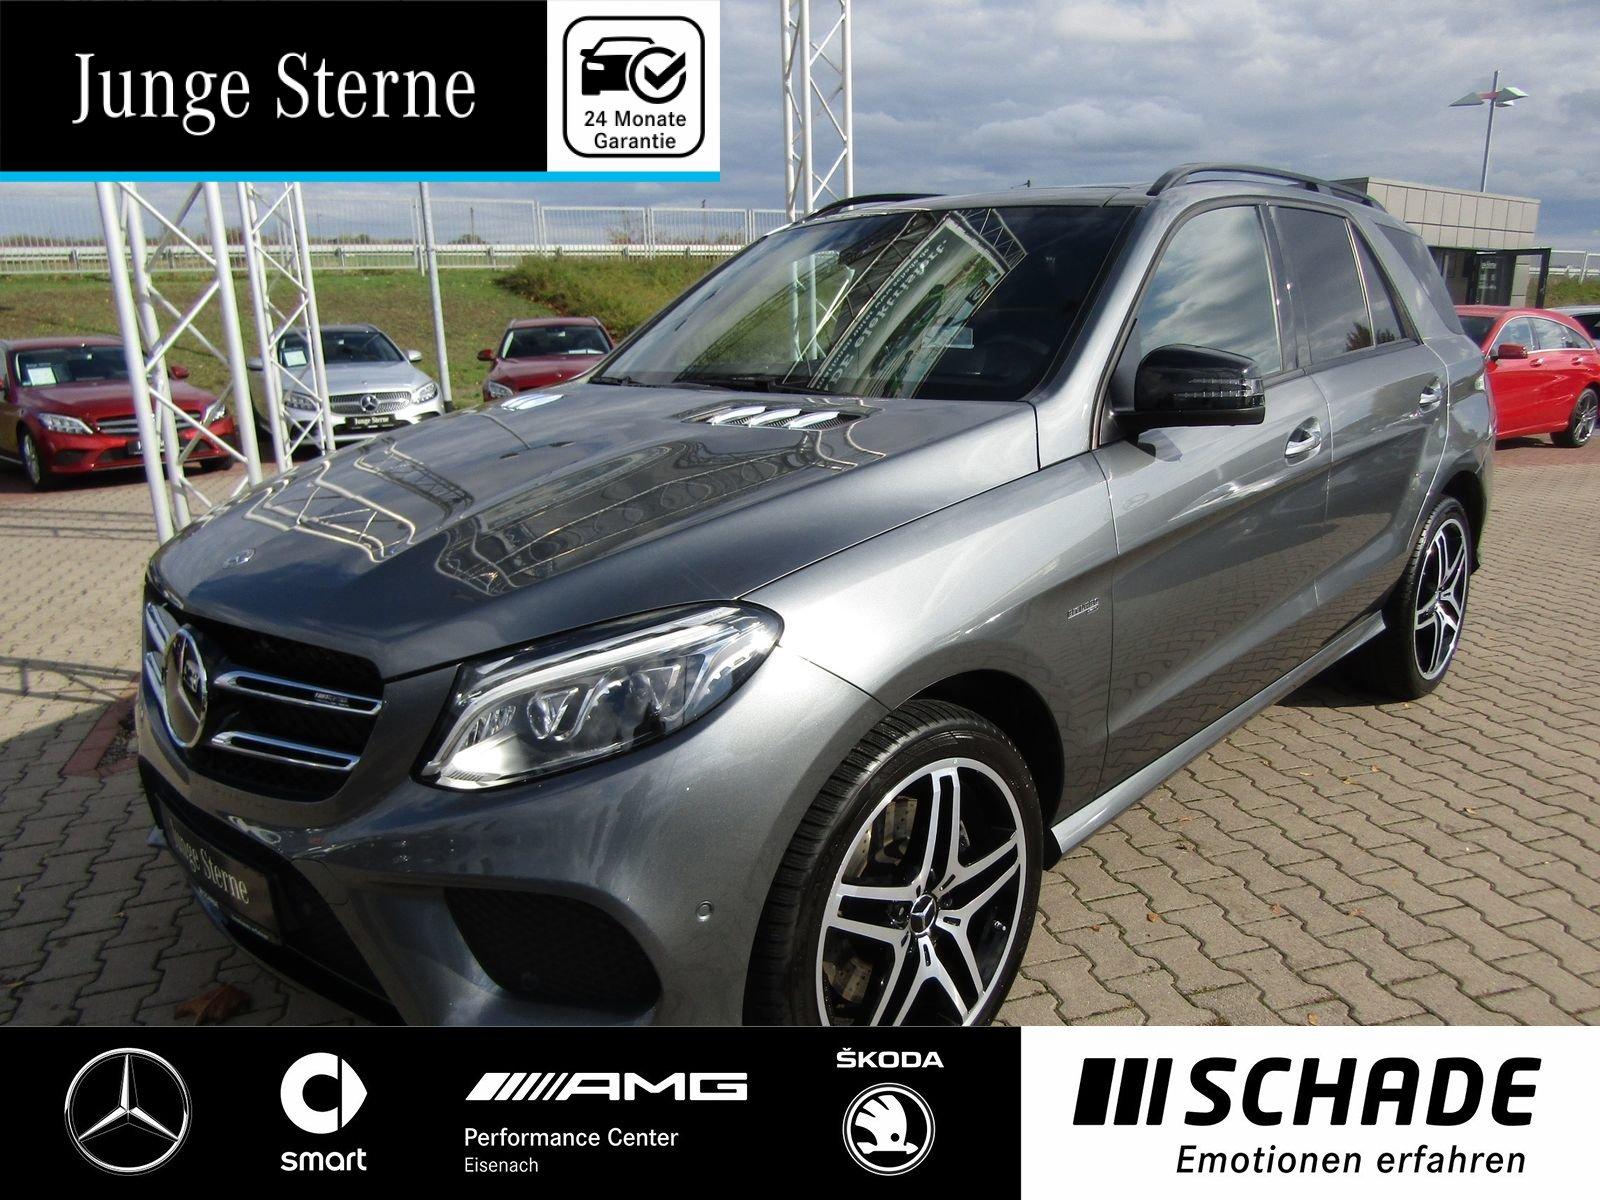 Mercedes-Benz GLE 43 AMG 4M Comand*Distronic*Night*Panorama*, Jahr 2017, petrol